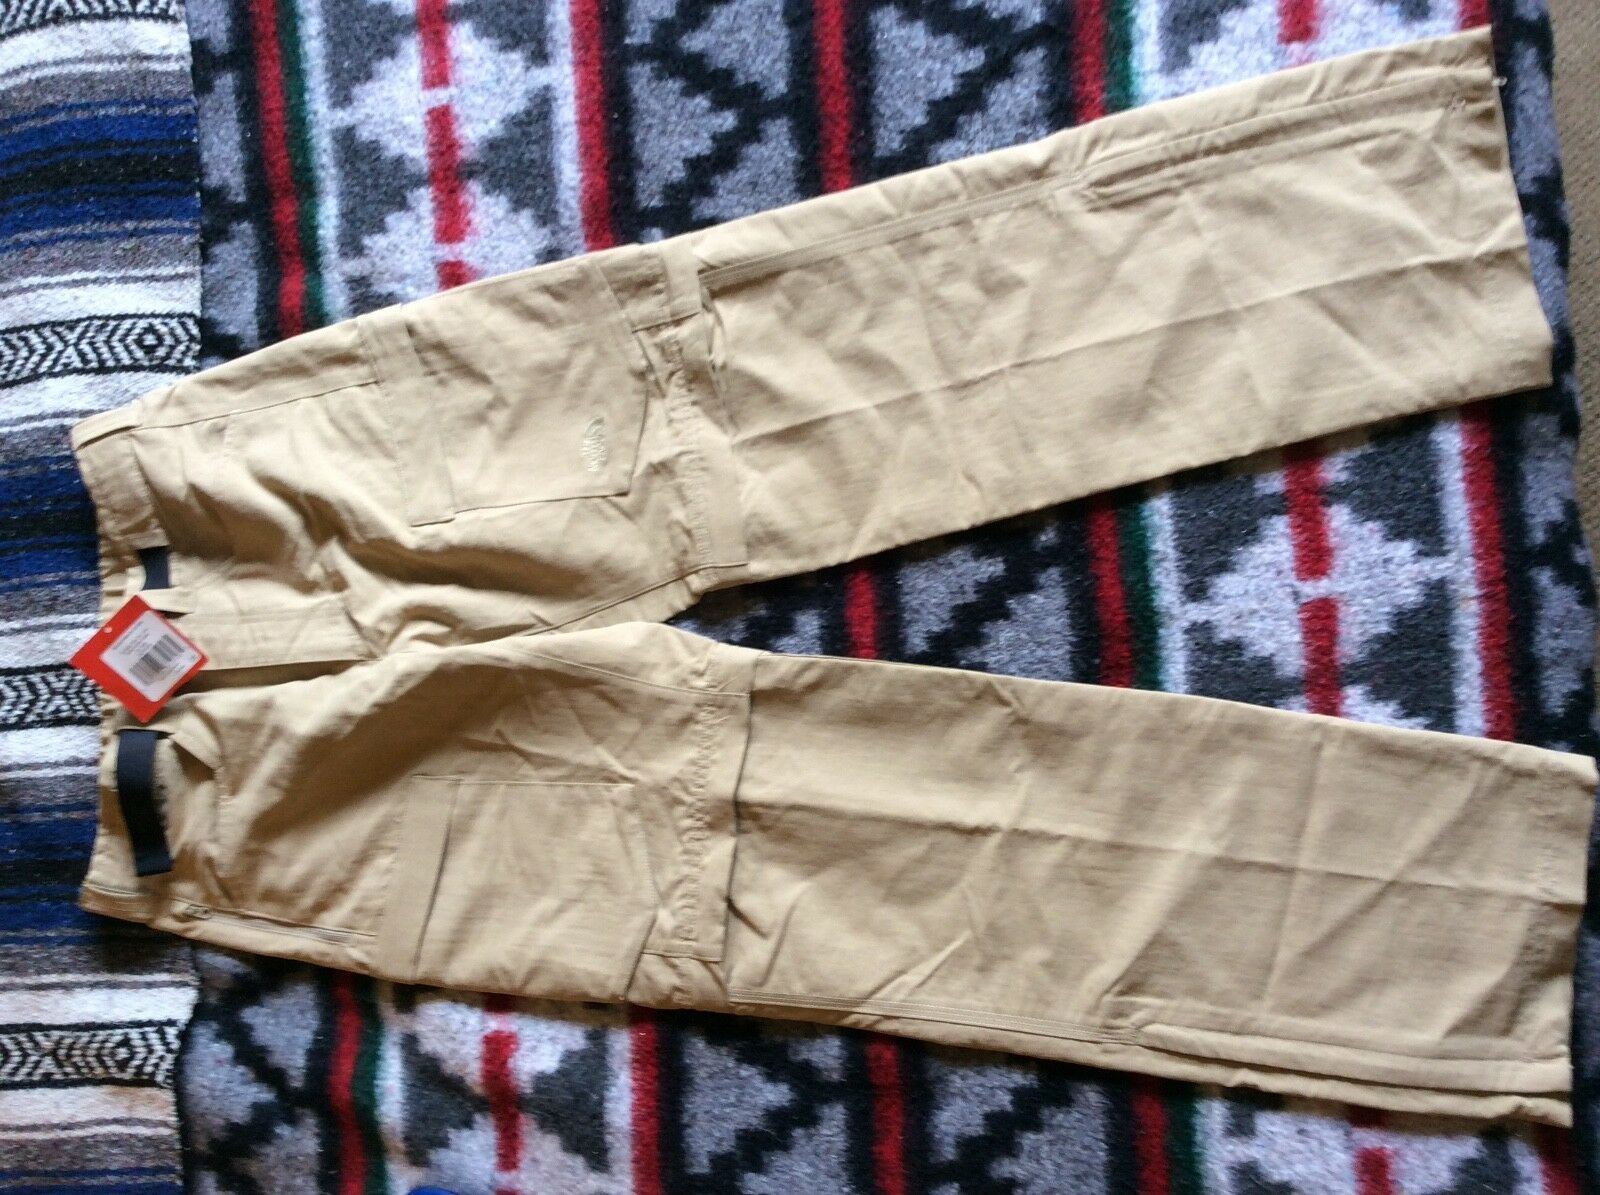 The North Face Men's Nylon Hiking Pants Beige Farbe Größe 32 x 31